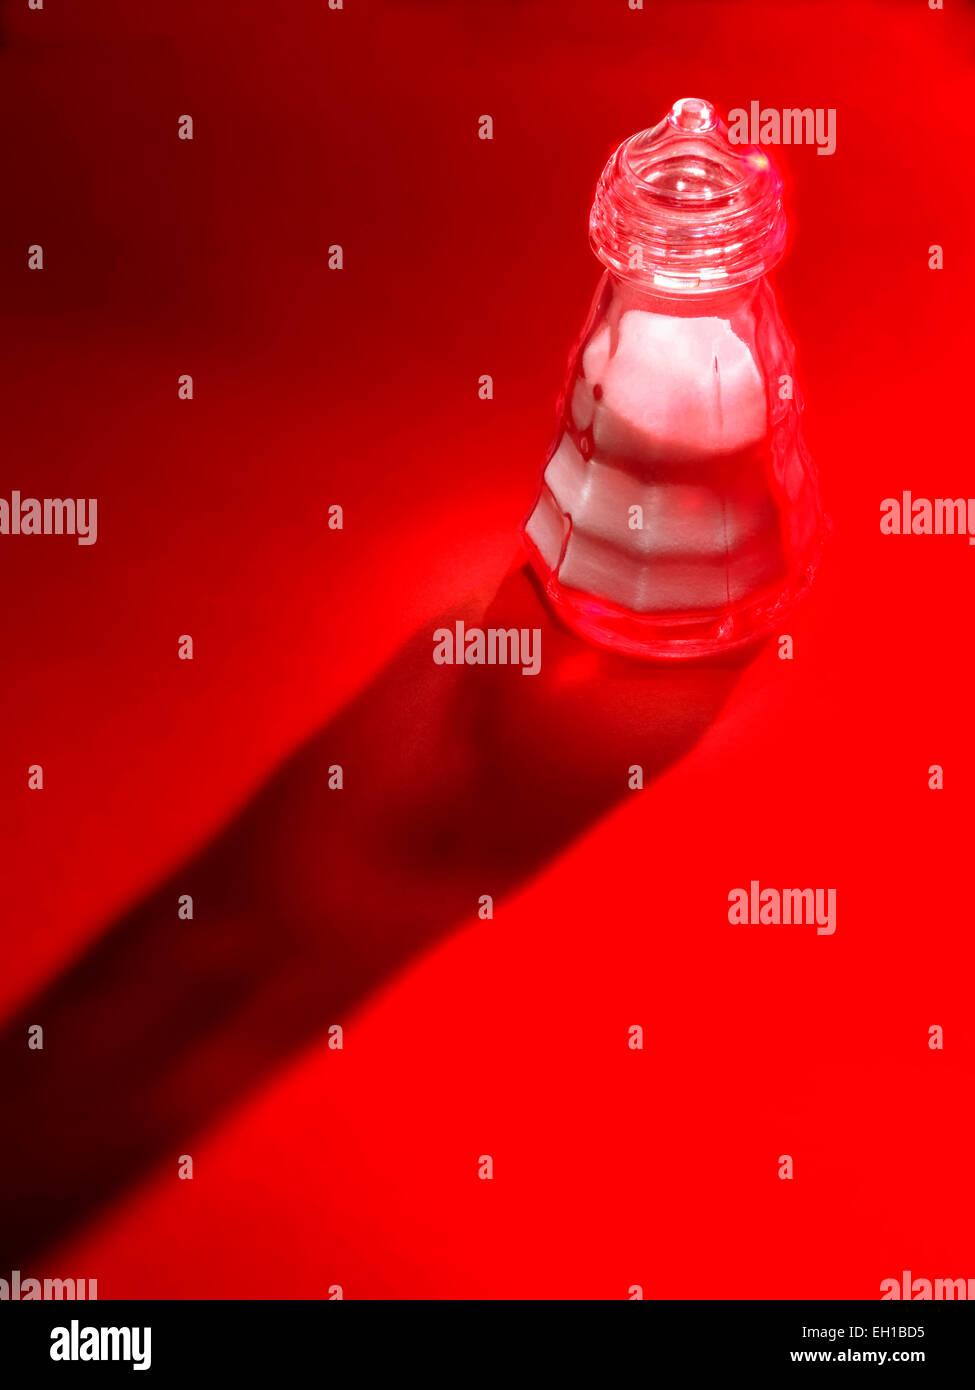 salt cellar - Stock Image